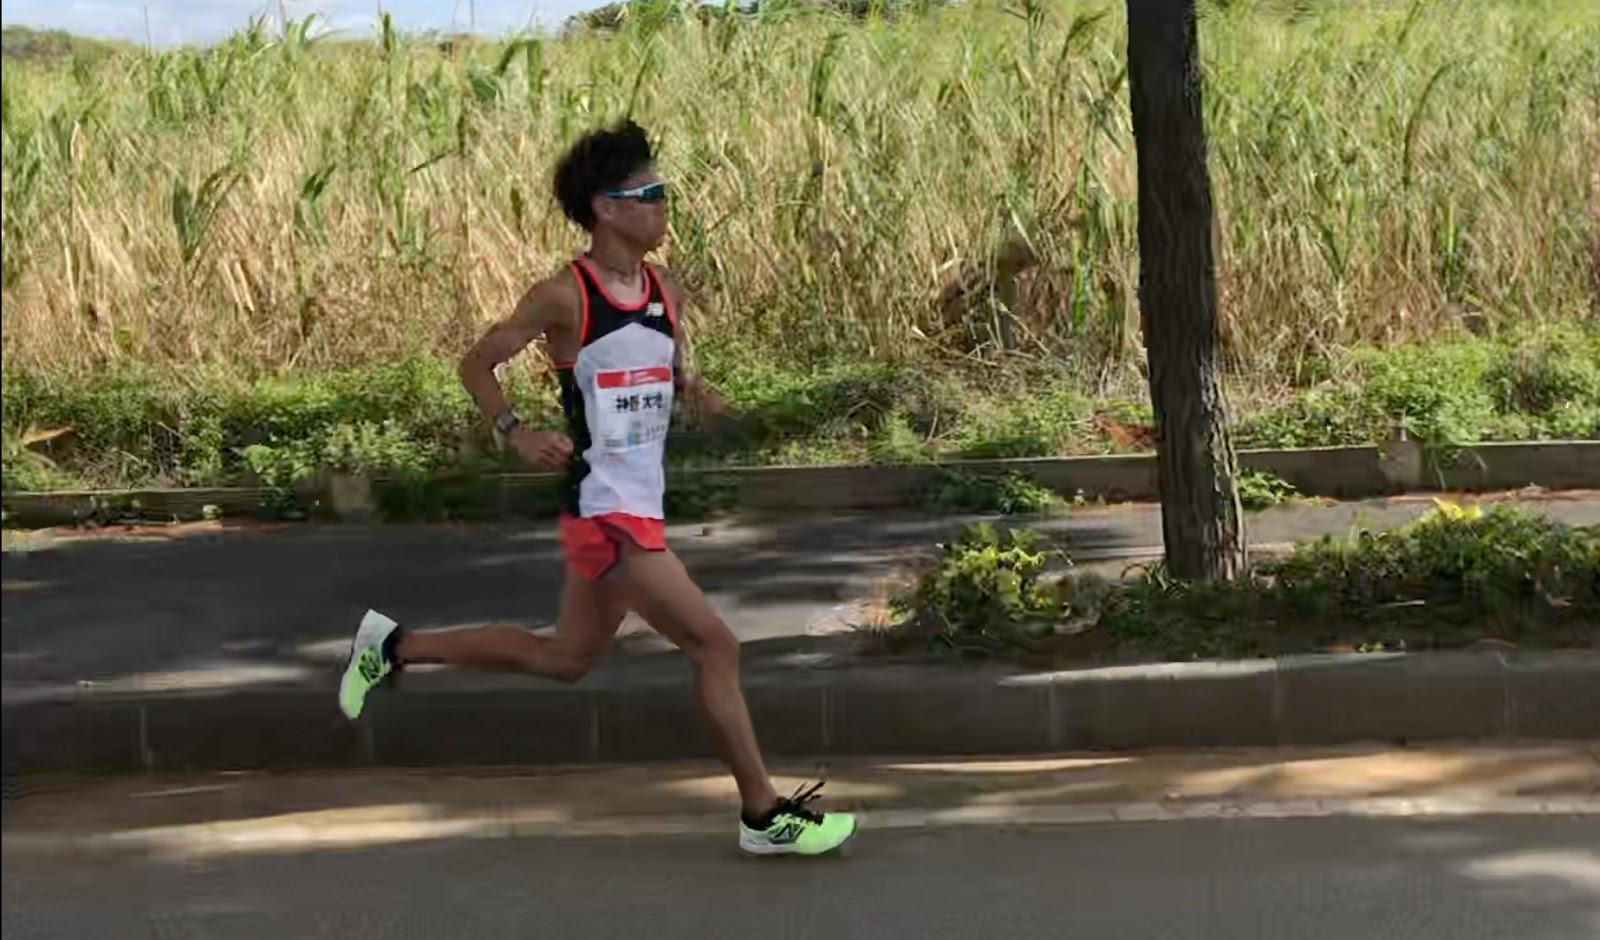 f07c01e5b5 「横浜マラソンEXPO2018」で見つけたランナーに教えたいアイテム&ブース集 | 撮影/文・中村優 並木政孝 GetNavi web ゲットナビ  http://bit.ly/2SzdGm2